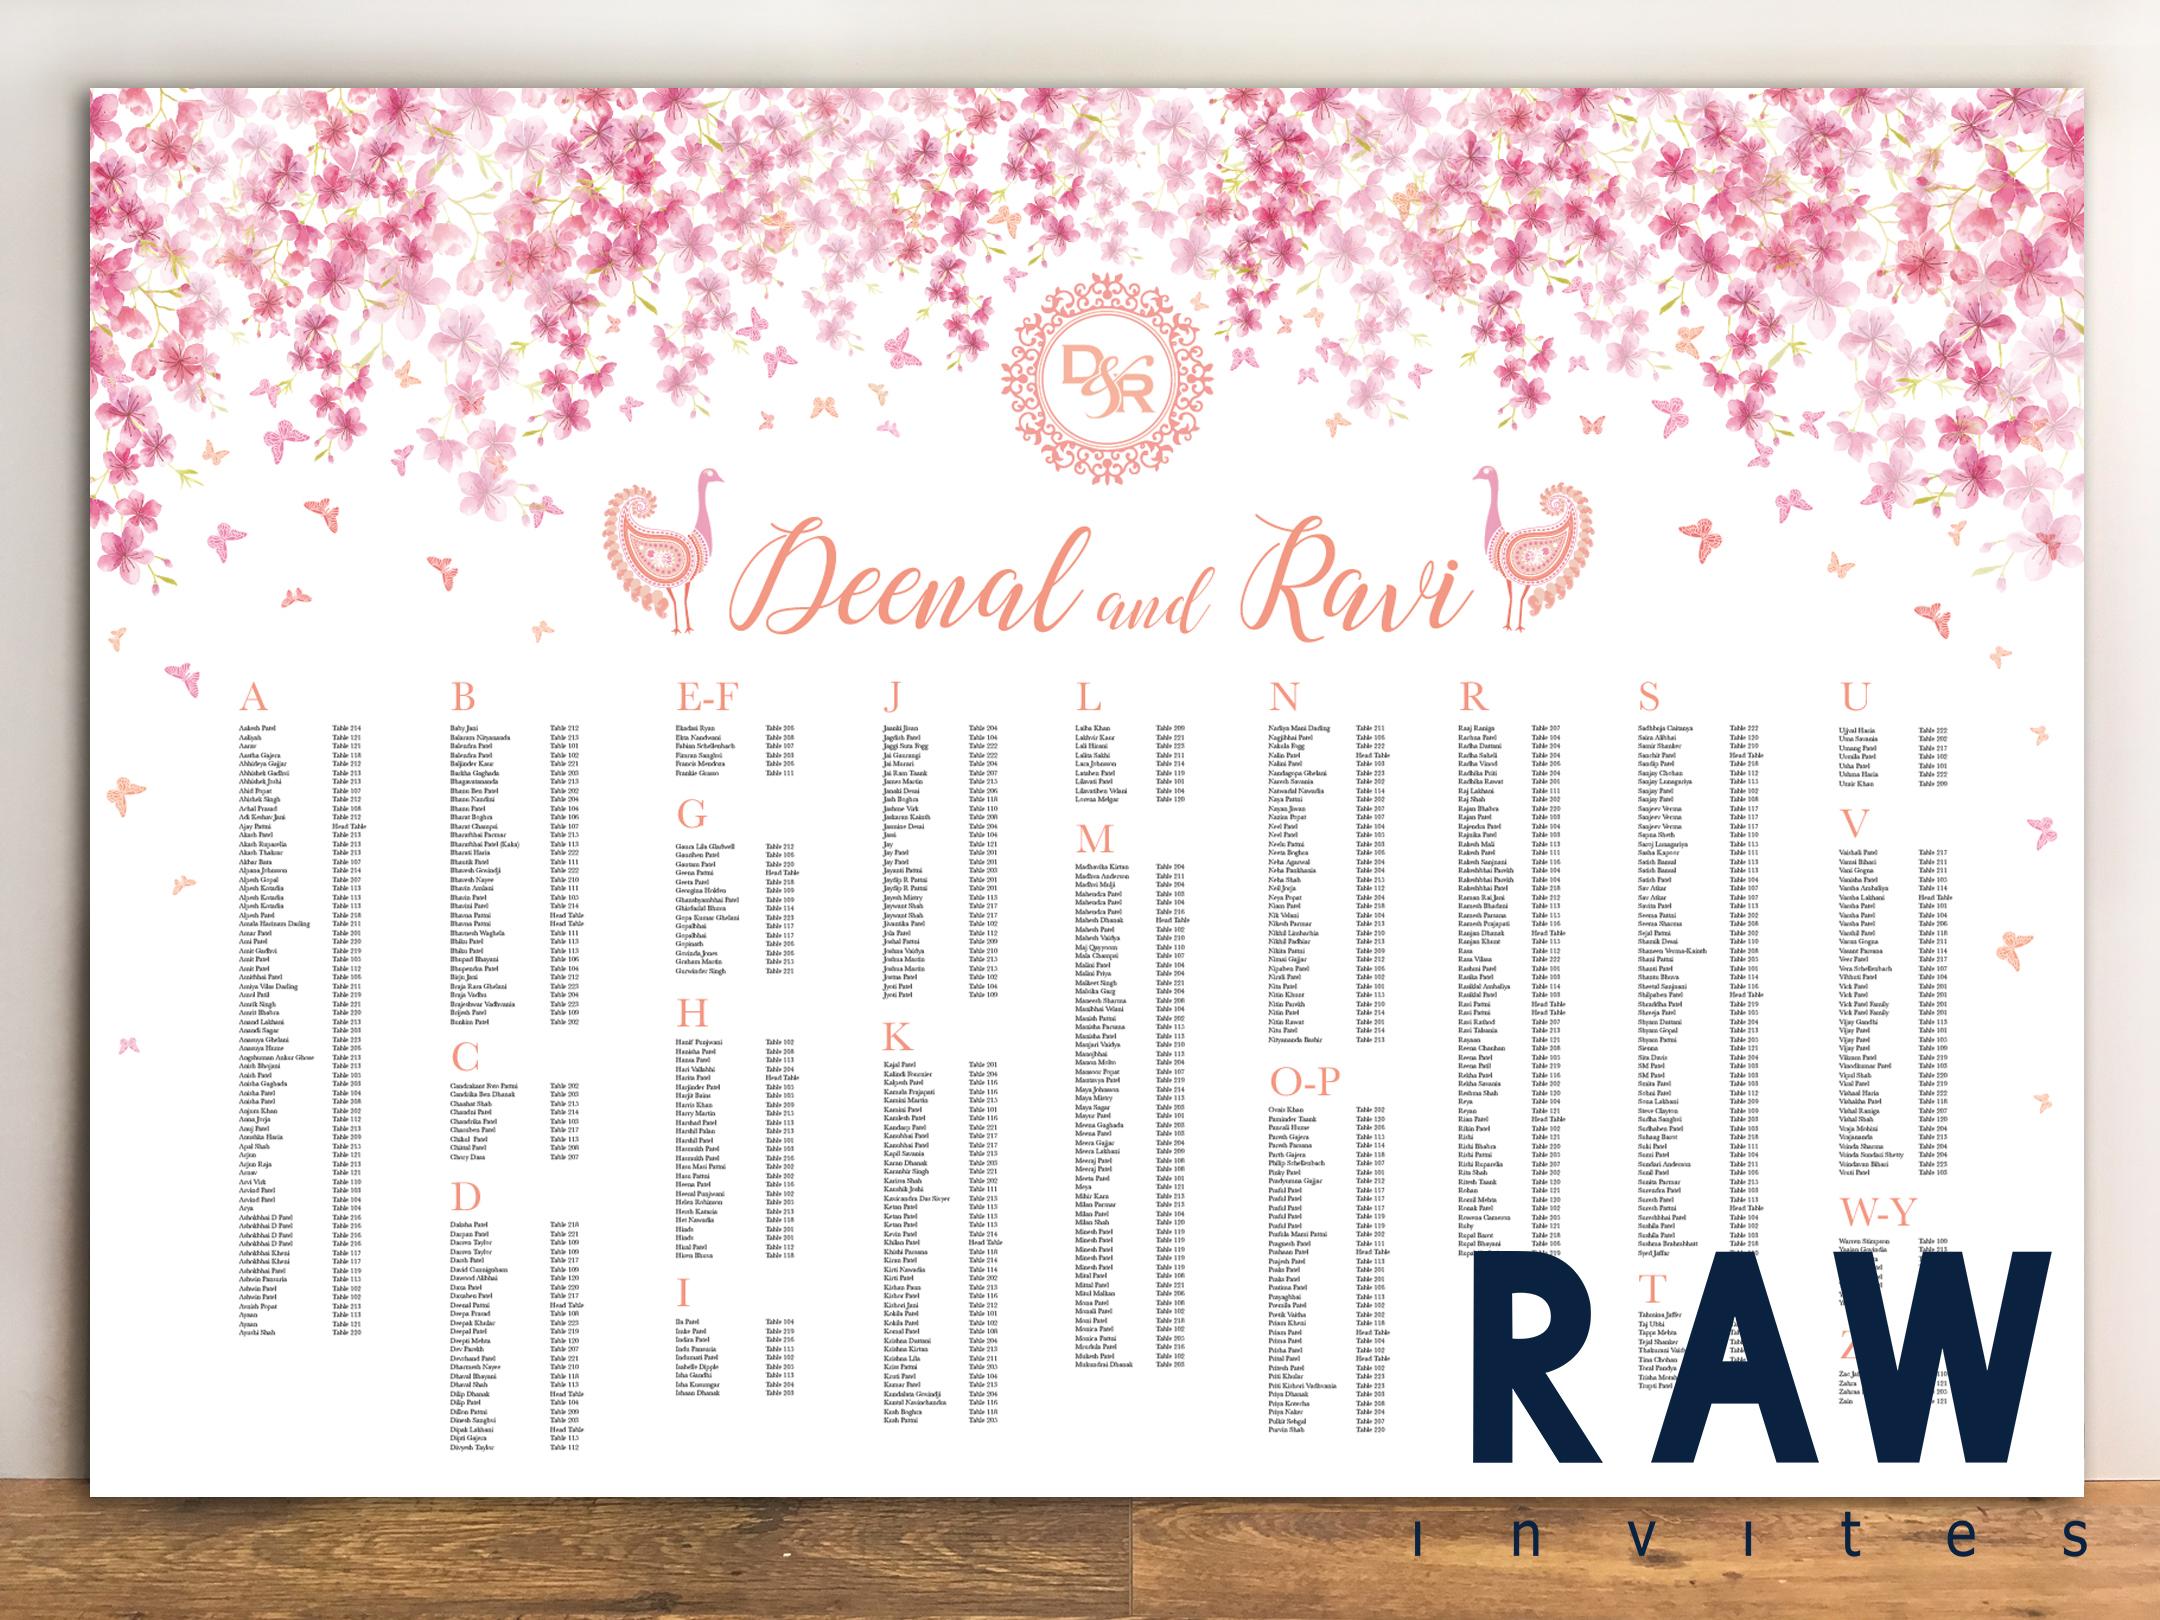 Deenal & Ravi (Blossom Love)